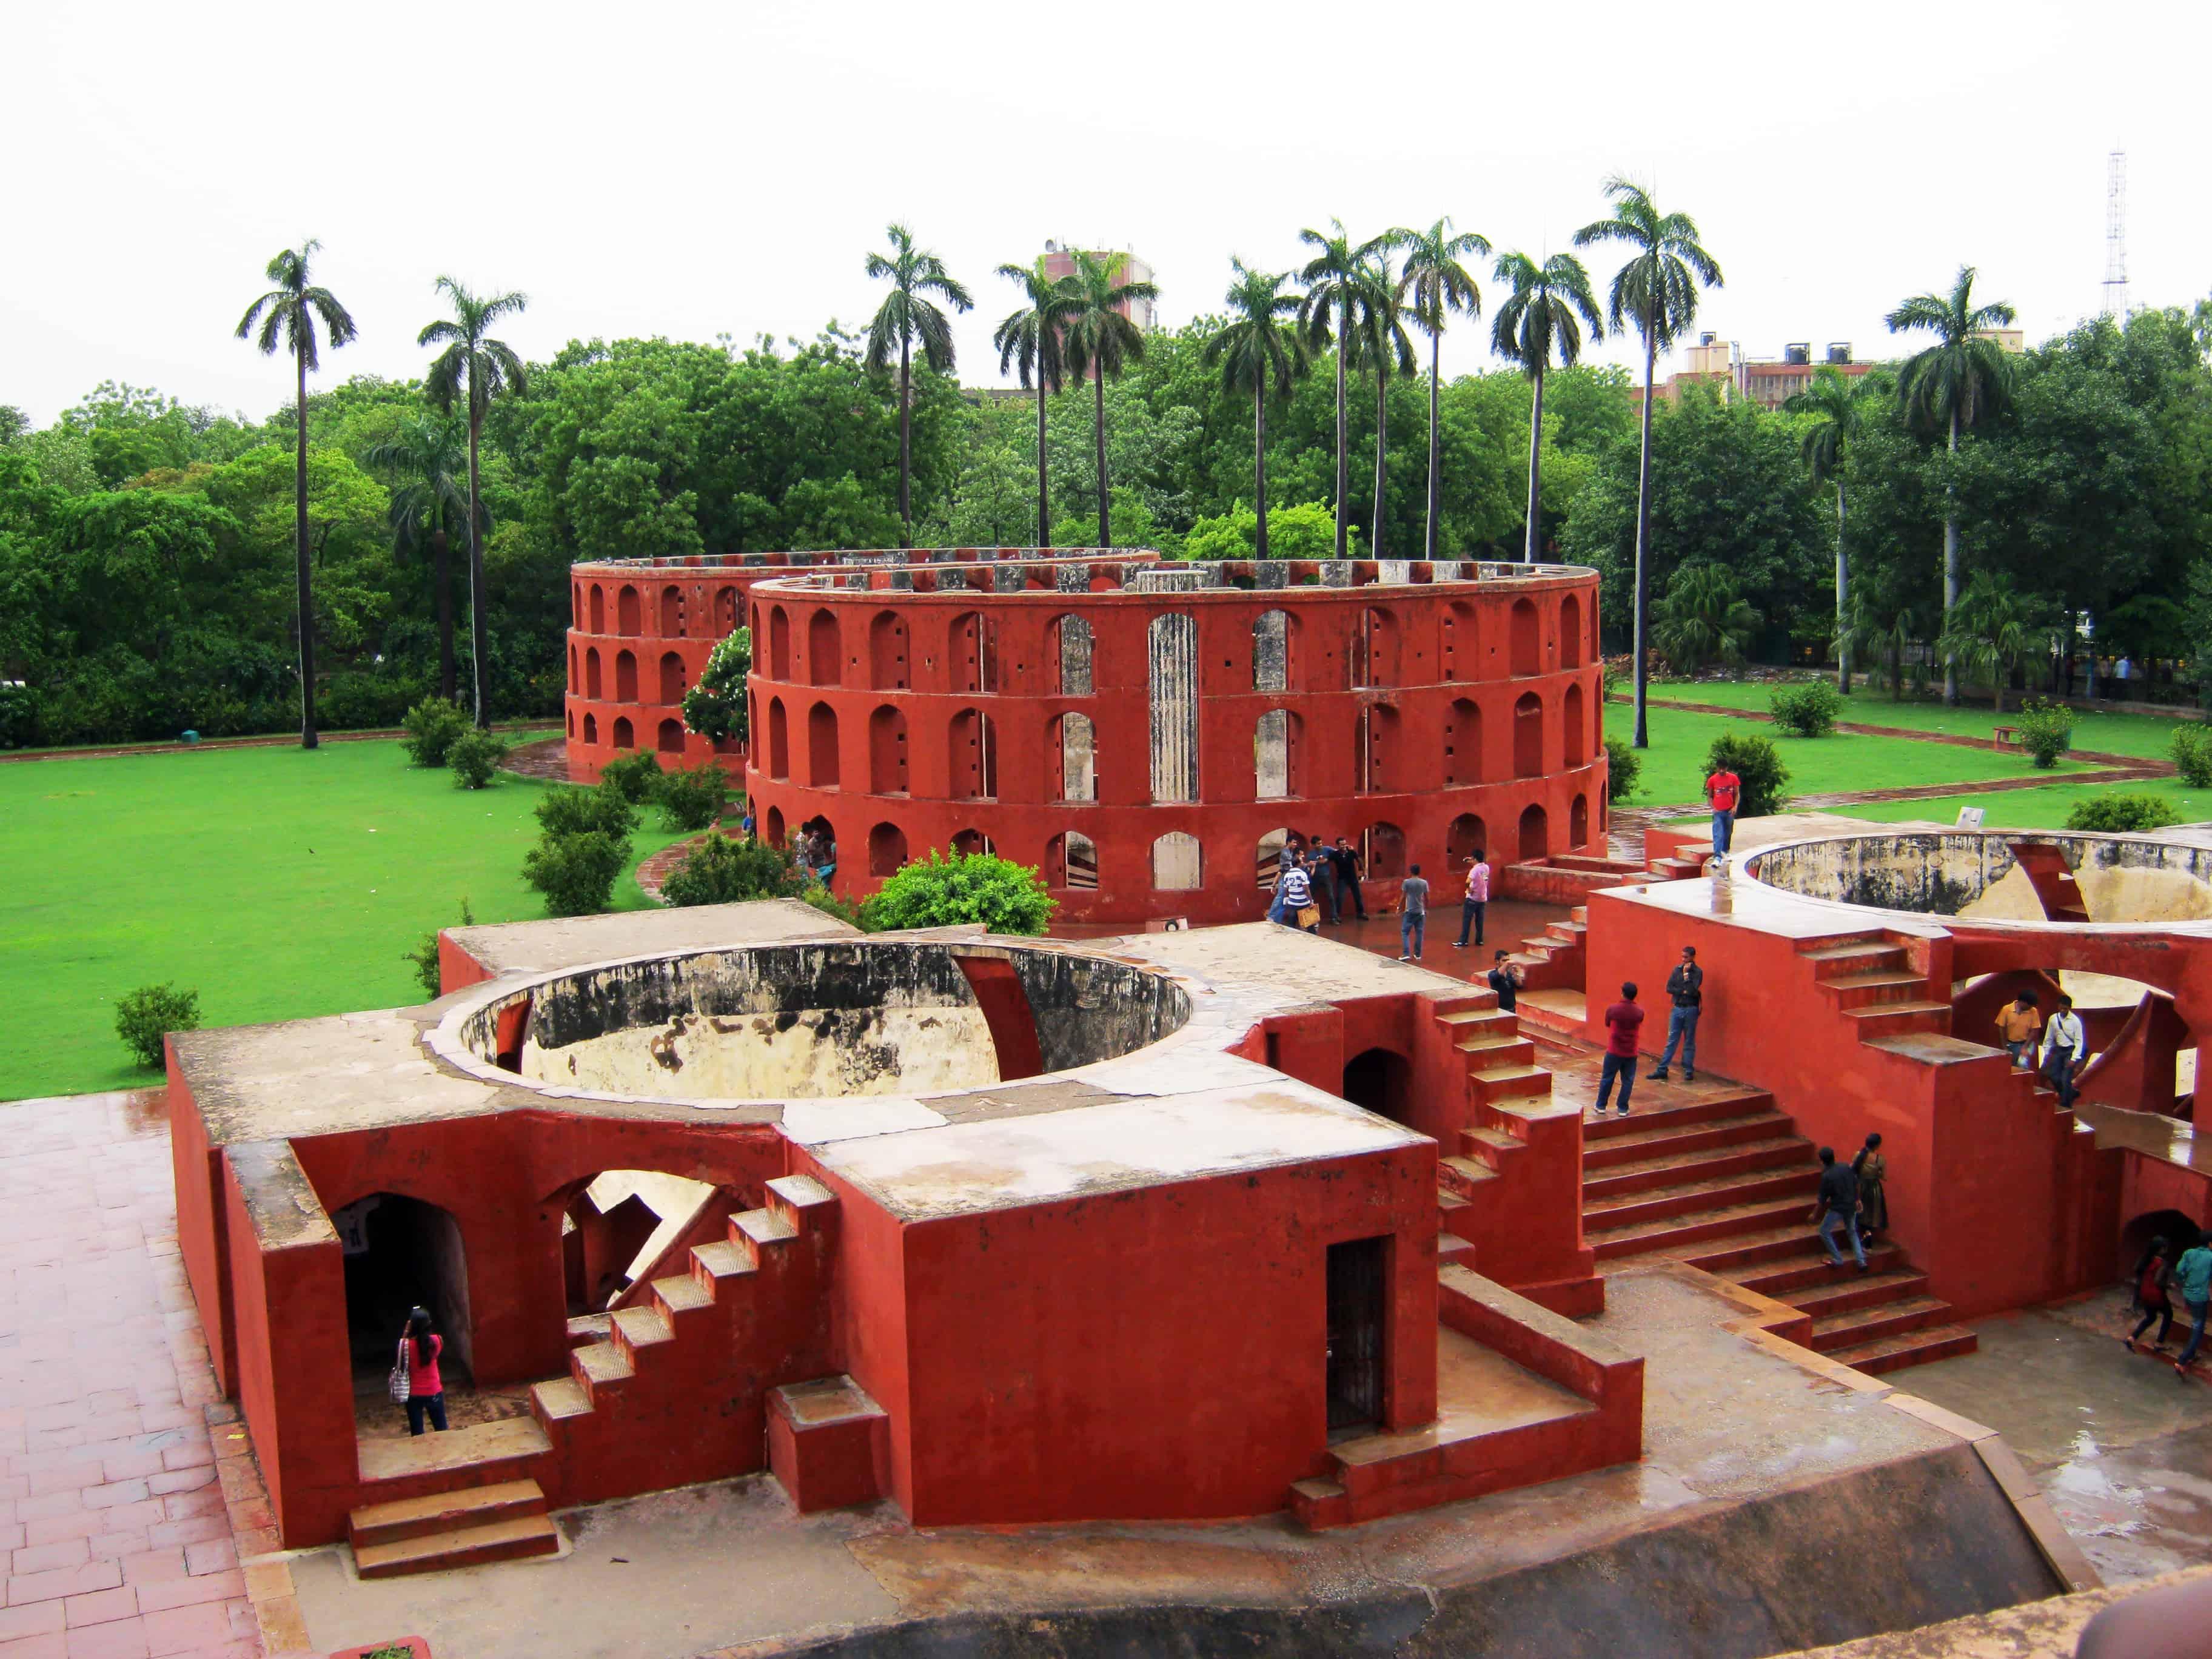 Jantar mantar - New Delhi, India